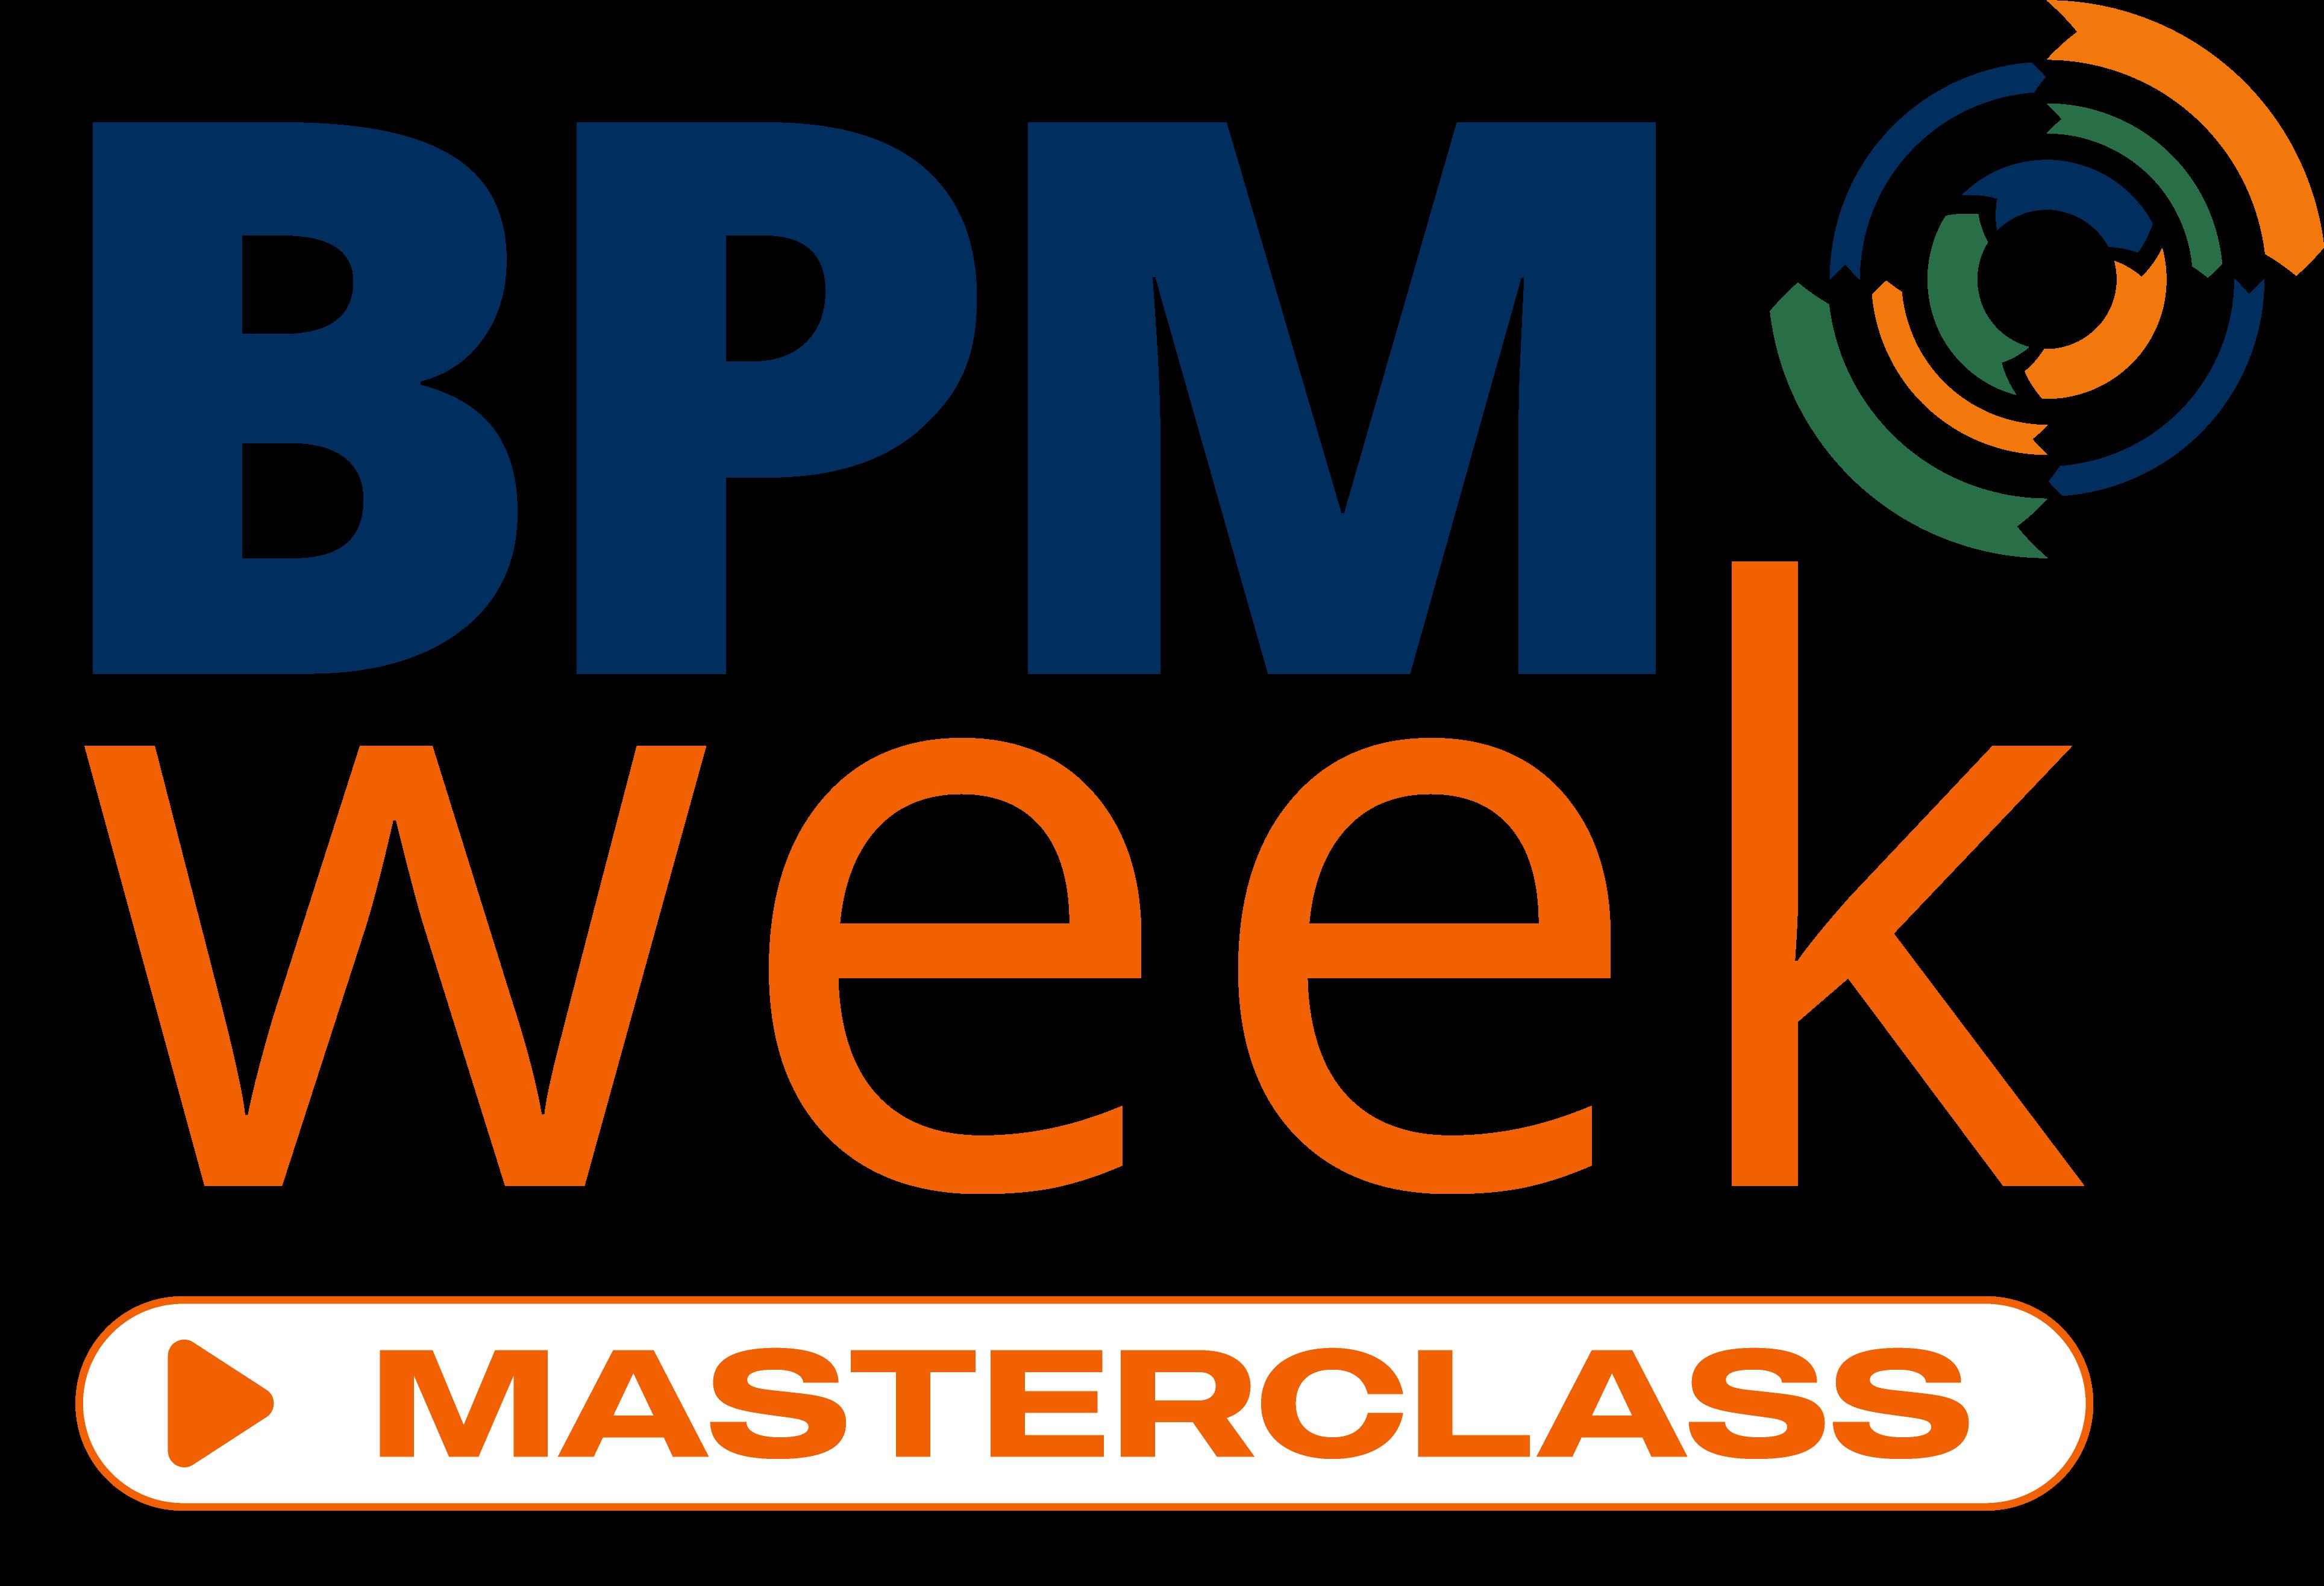 BPM Week Masterclass - Bolivia Edition